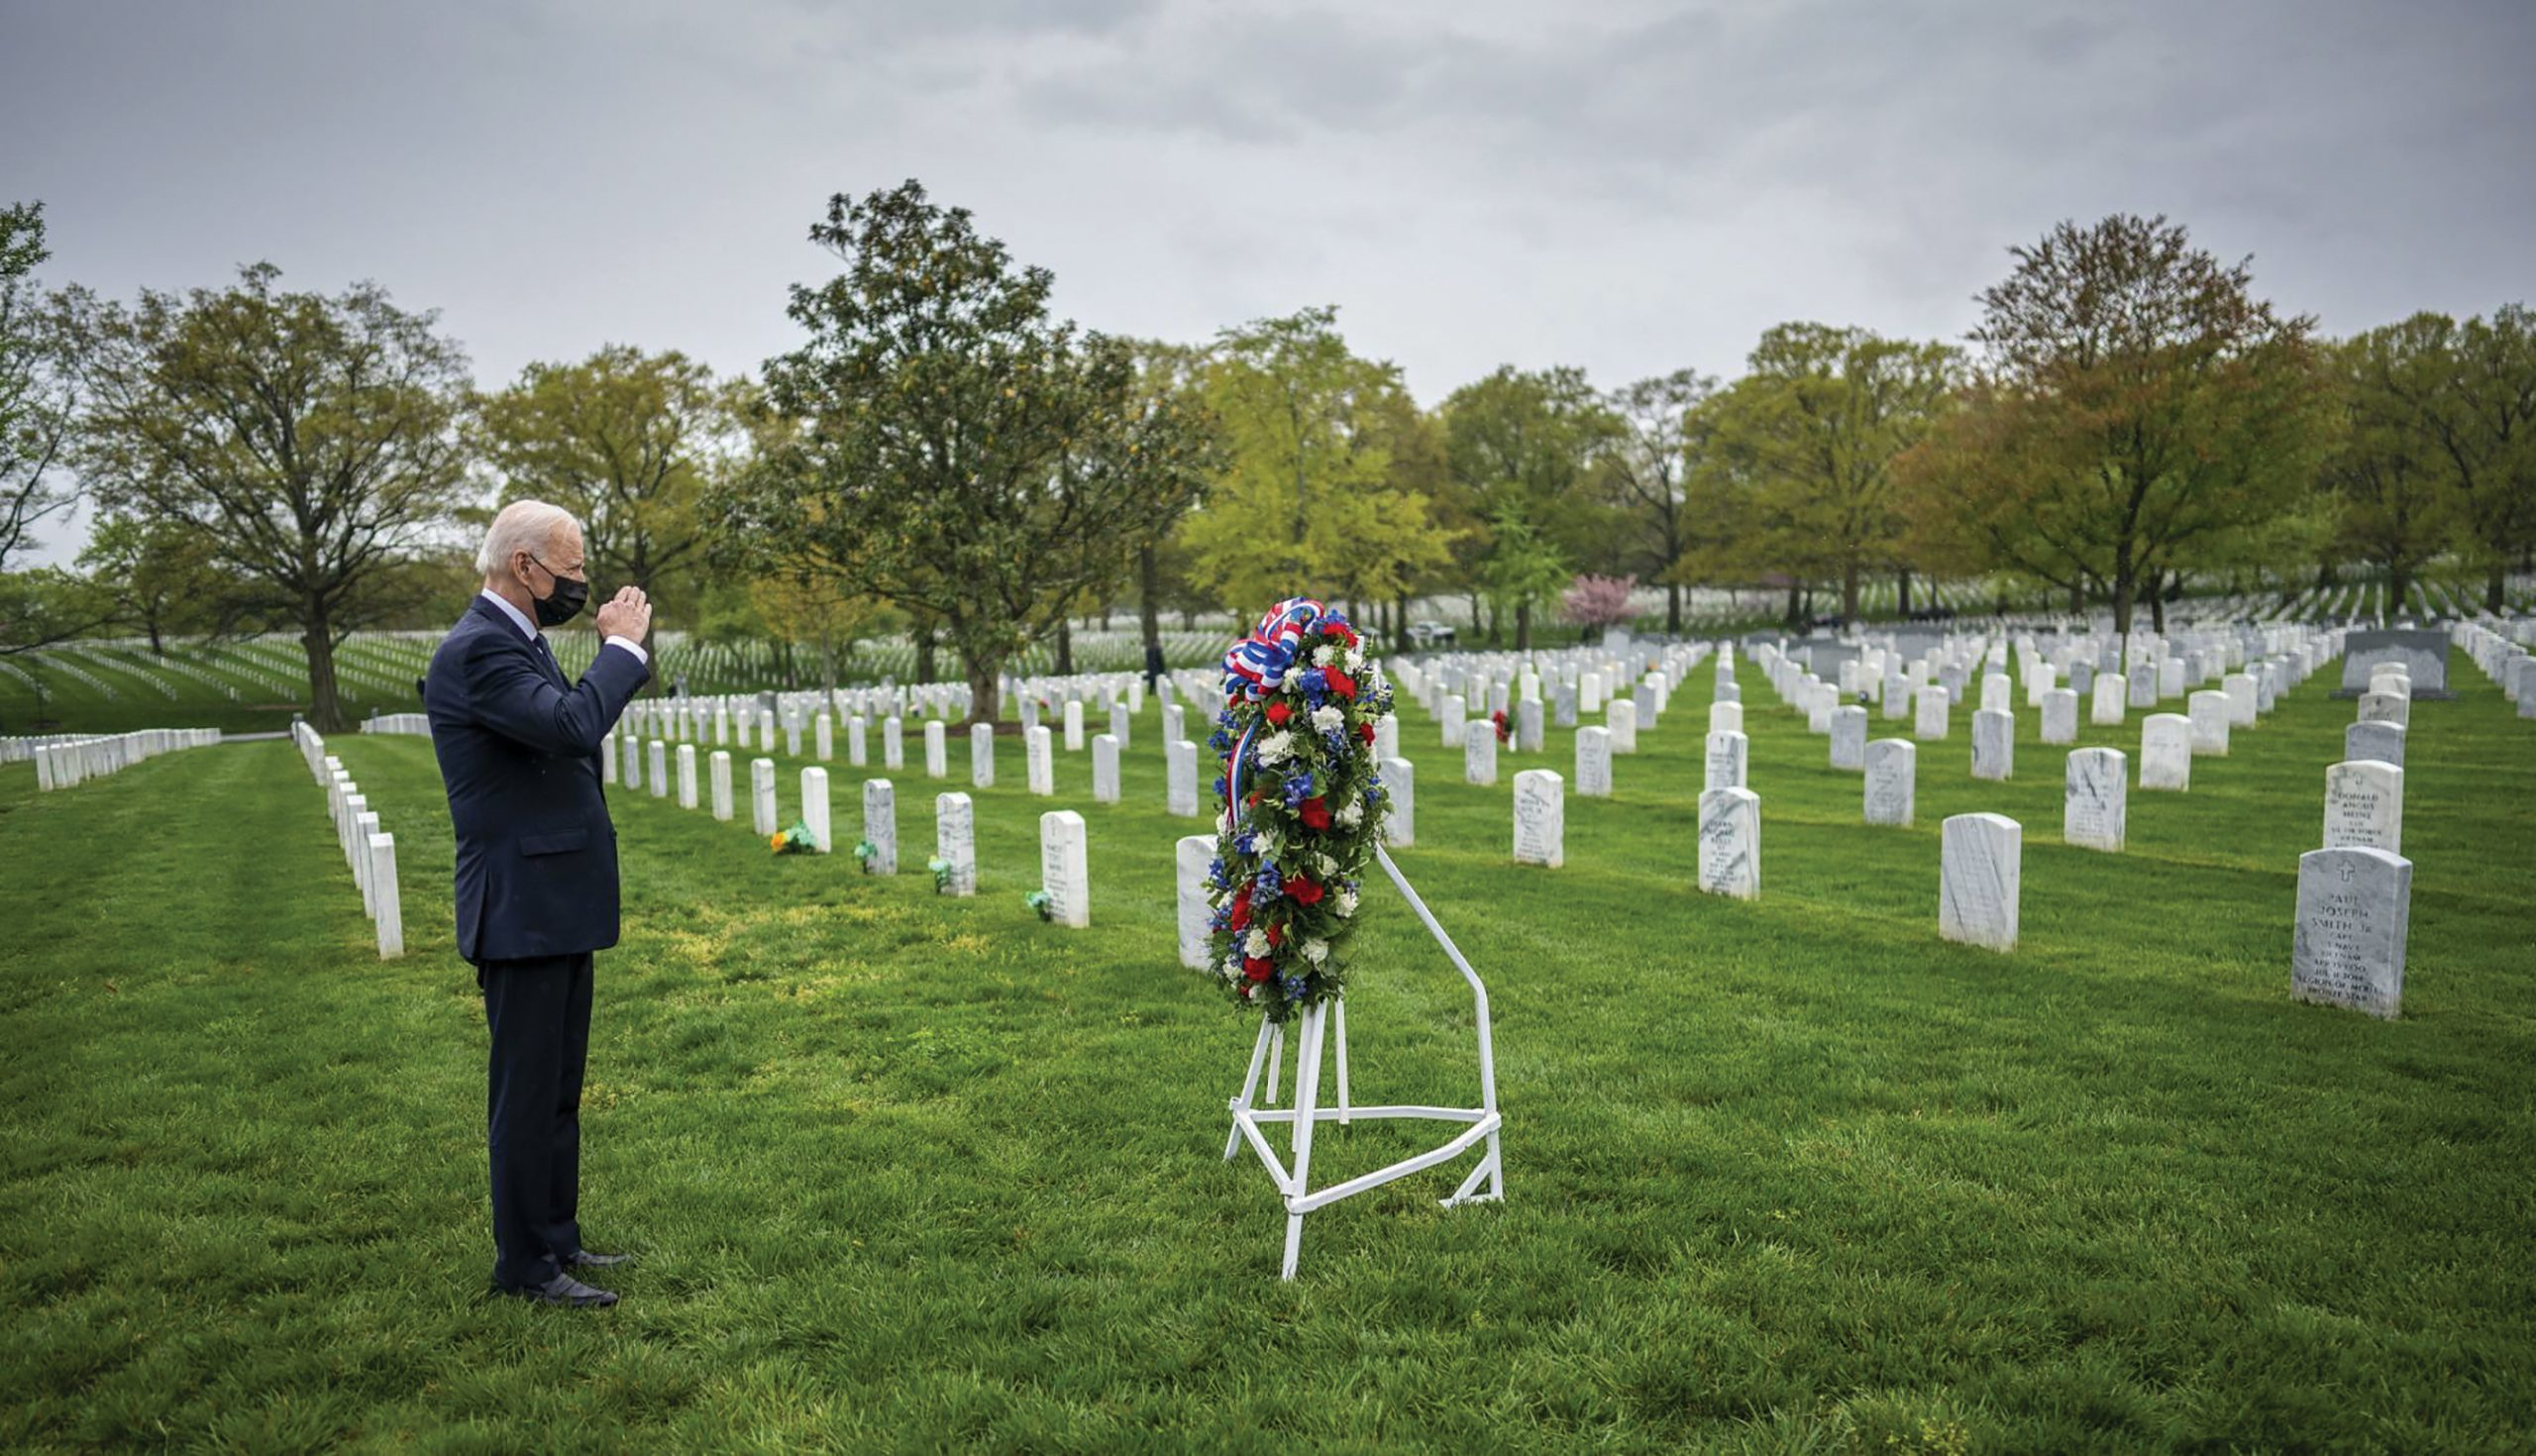 President Joe Biden salutes during a visit to Section 60